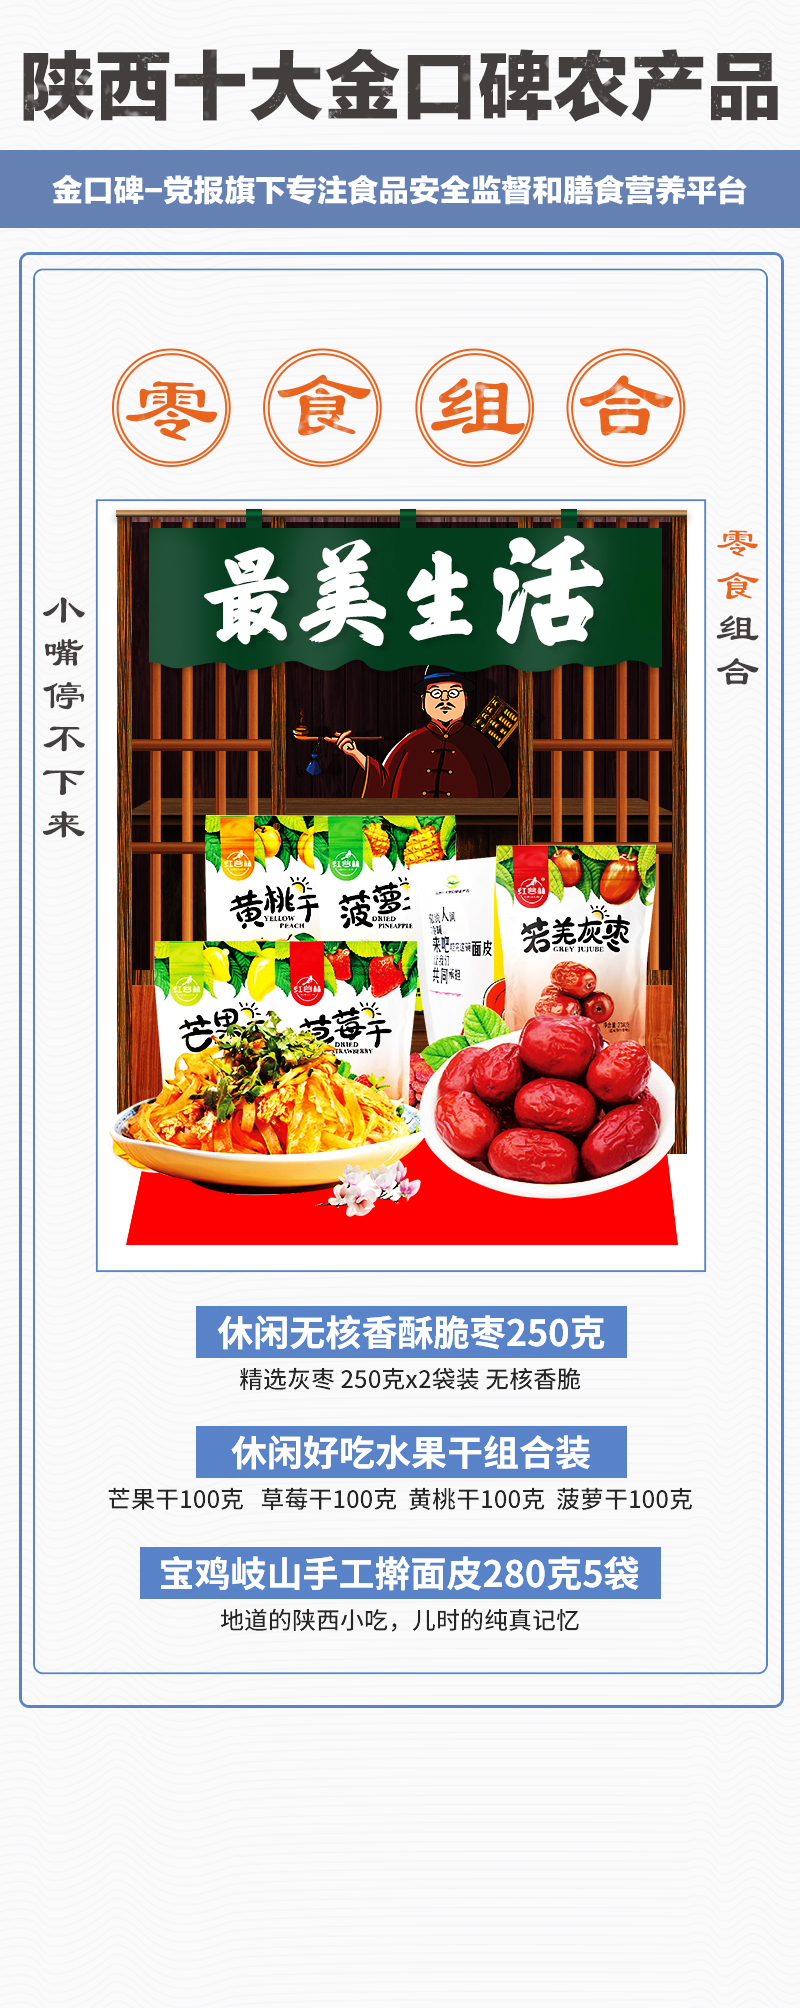 http://xinslu.com/attachment/images/3/2019/04/k8oU1P0jXWW0wxP7SE1j0tstZpw12T.jpg